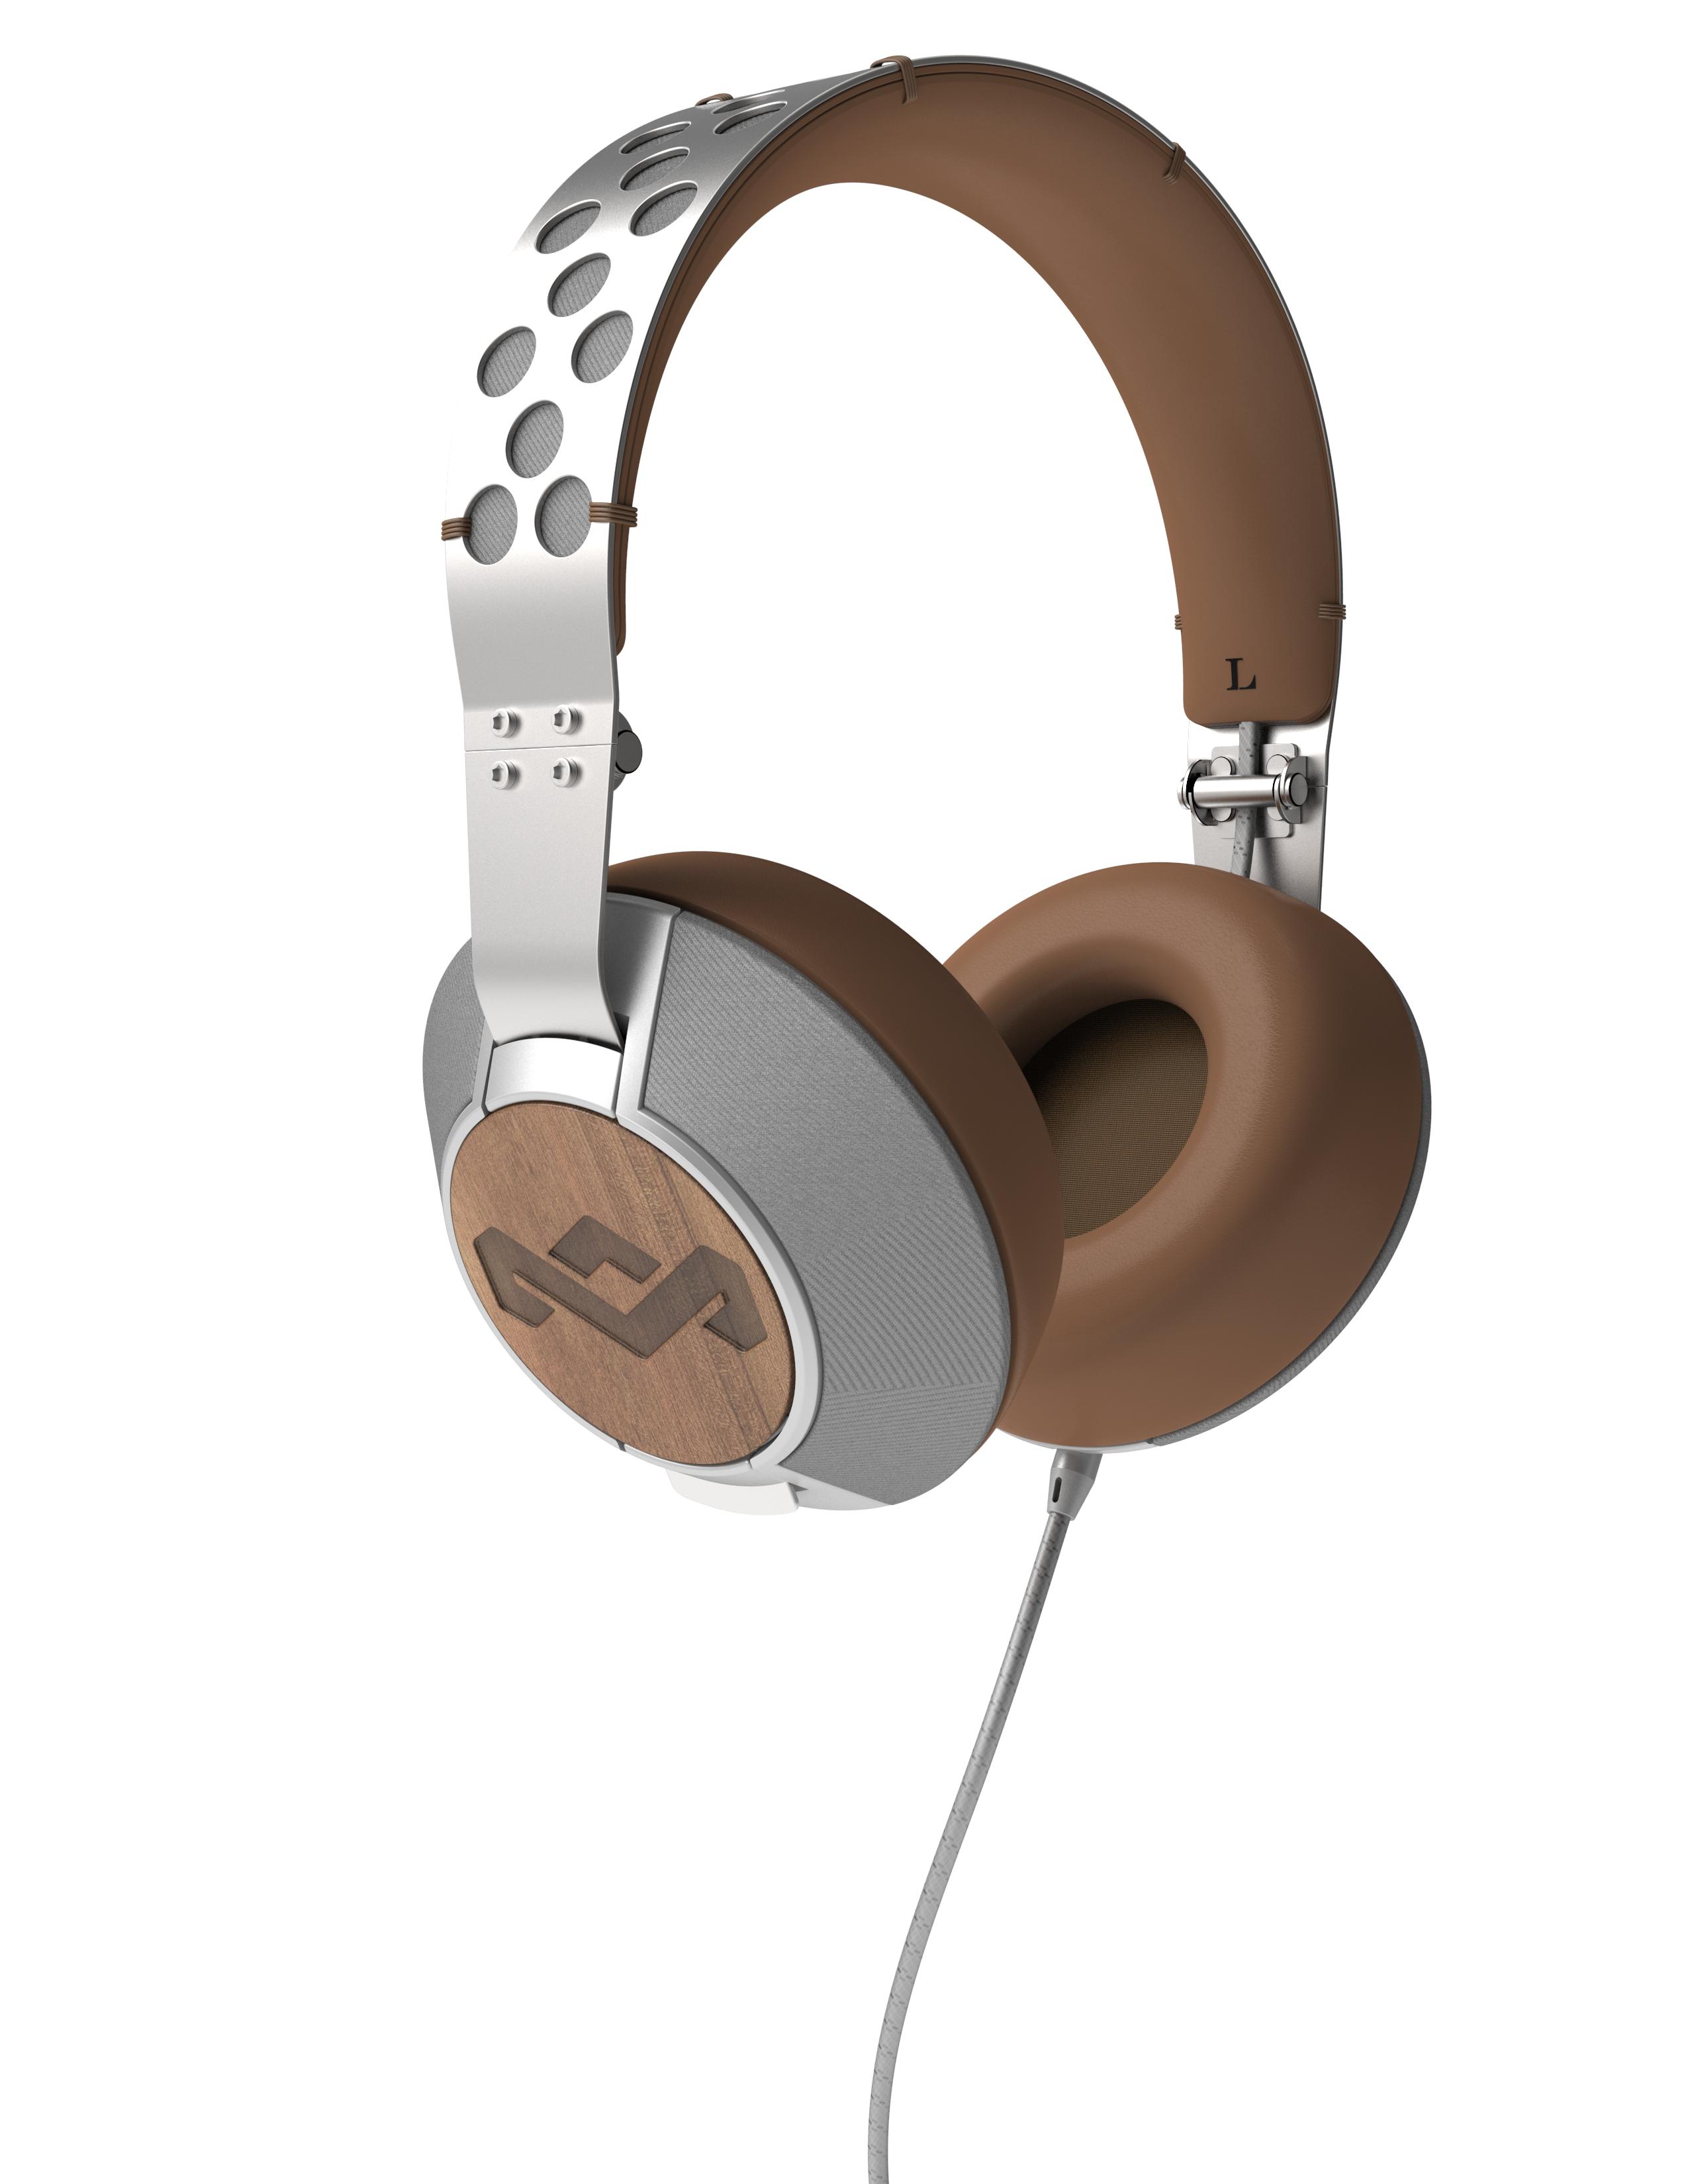 Pilcrow Marley Headphones